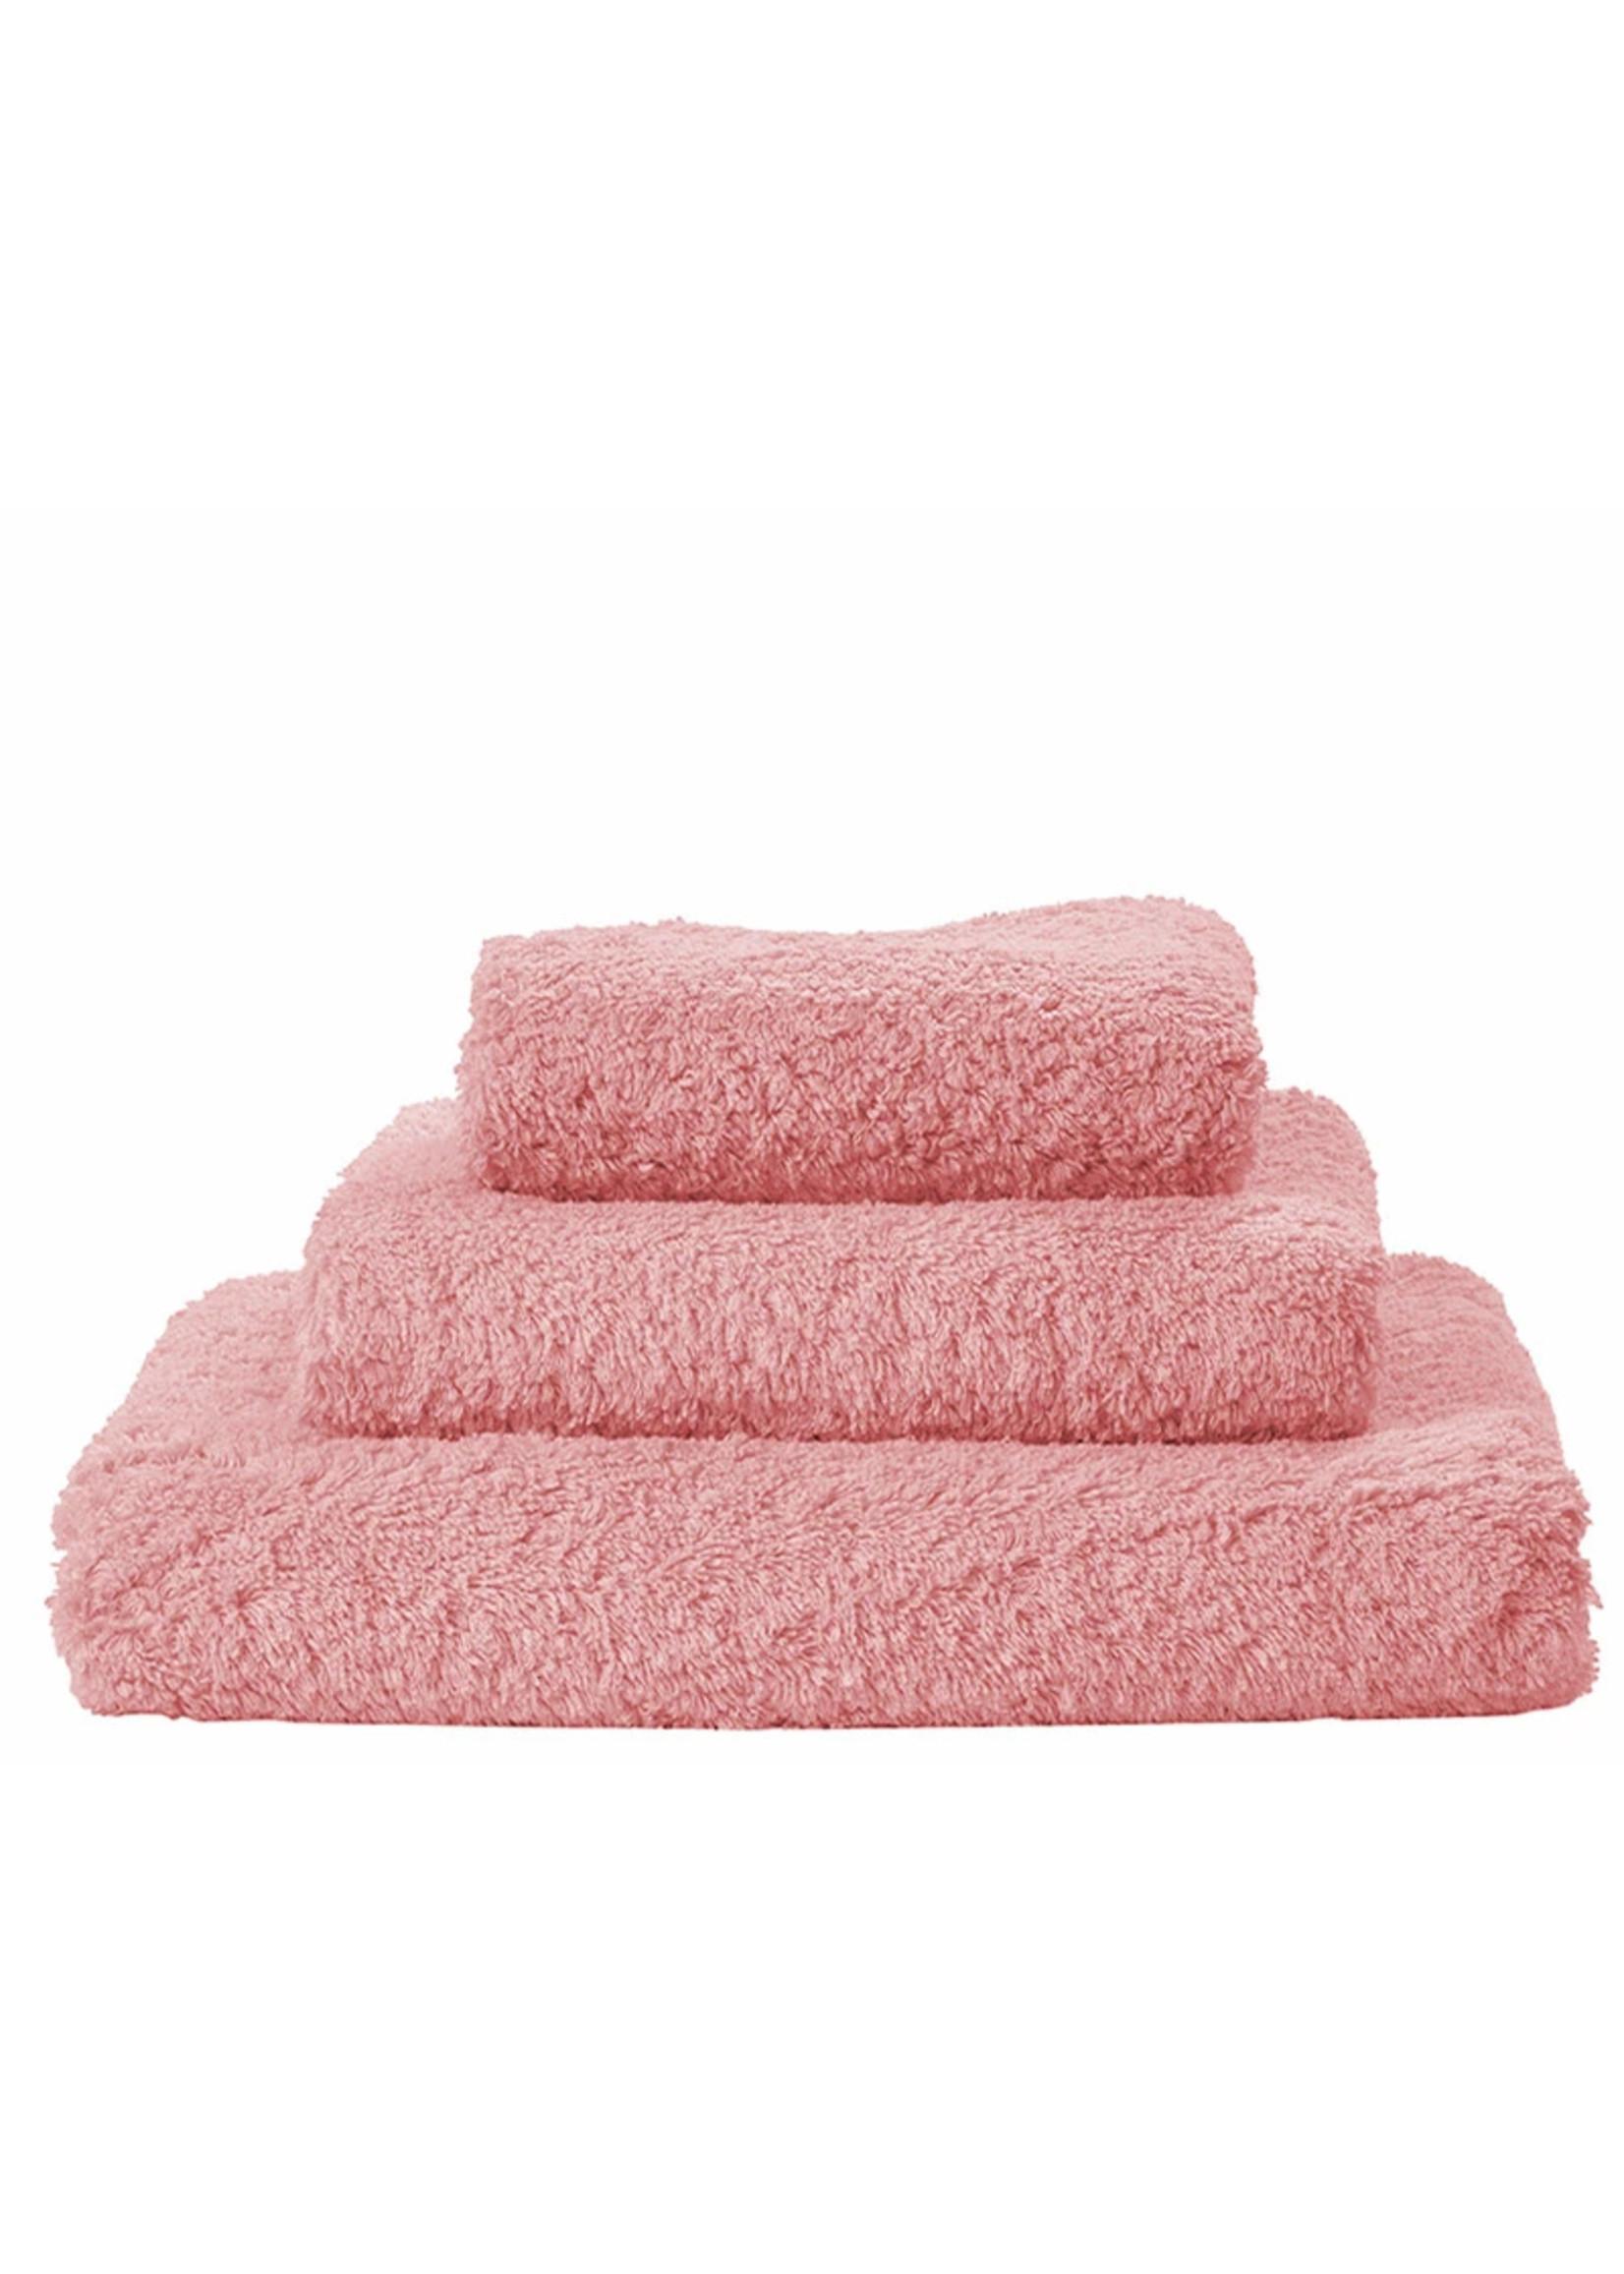 Abyss & Habidecor Super Pile Rosette Towels